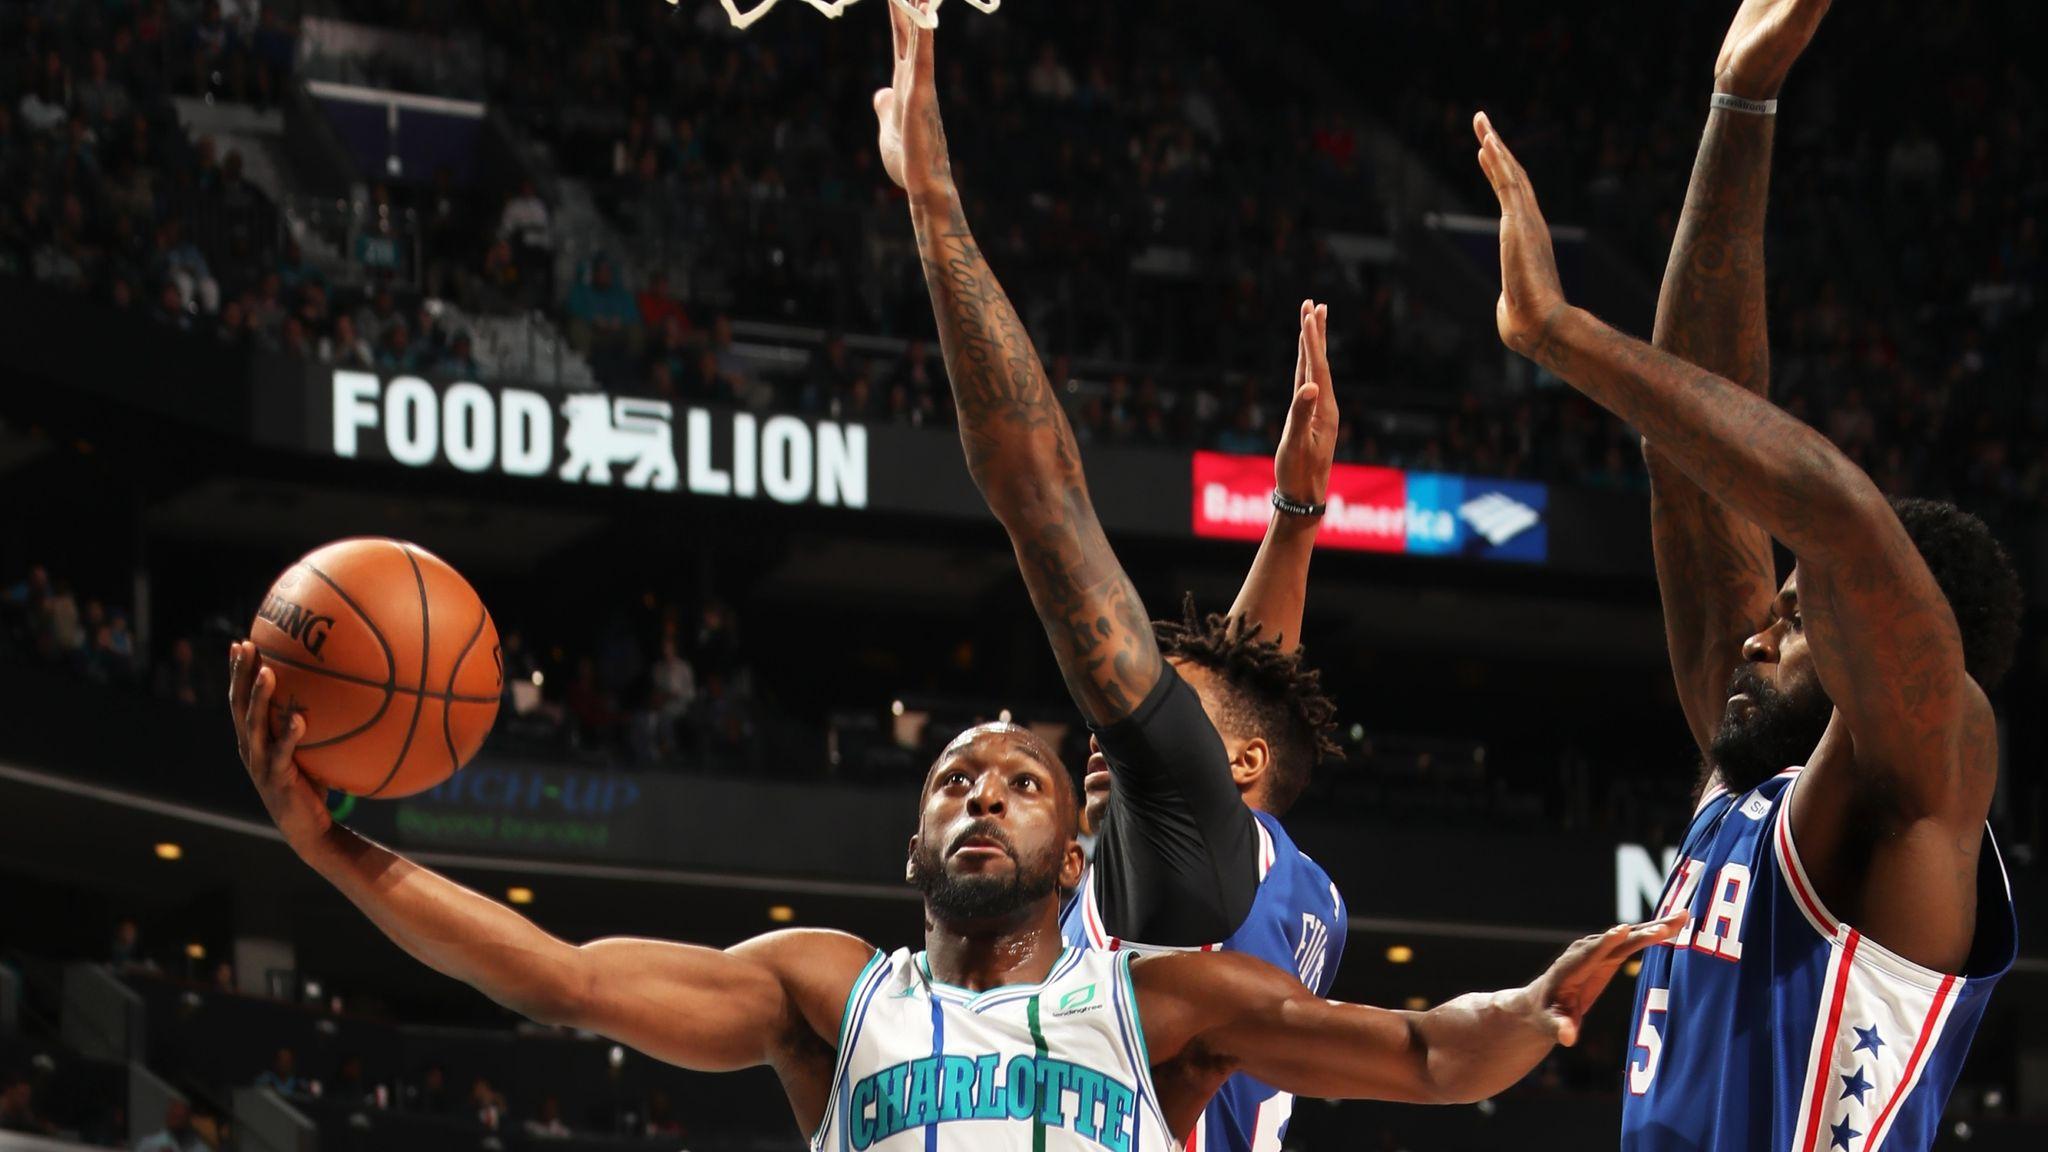 Kemba Walker scores career-high 60 points but Charlotte Hornets lose